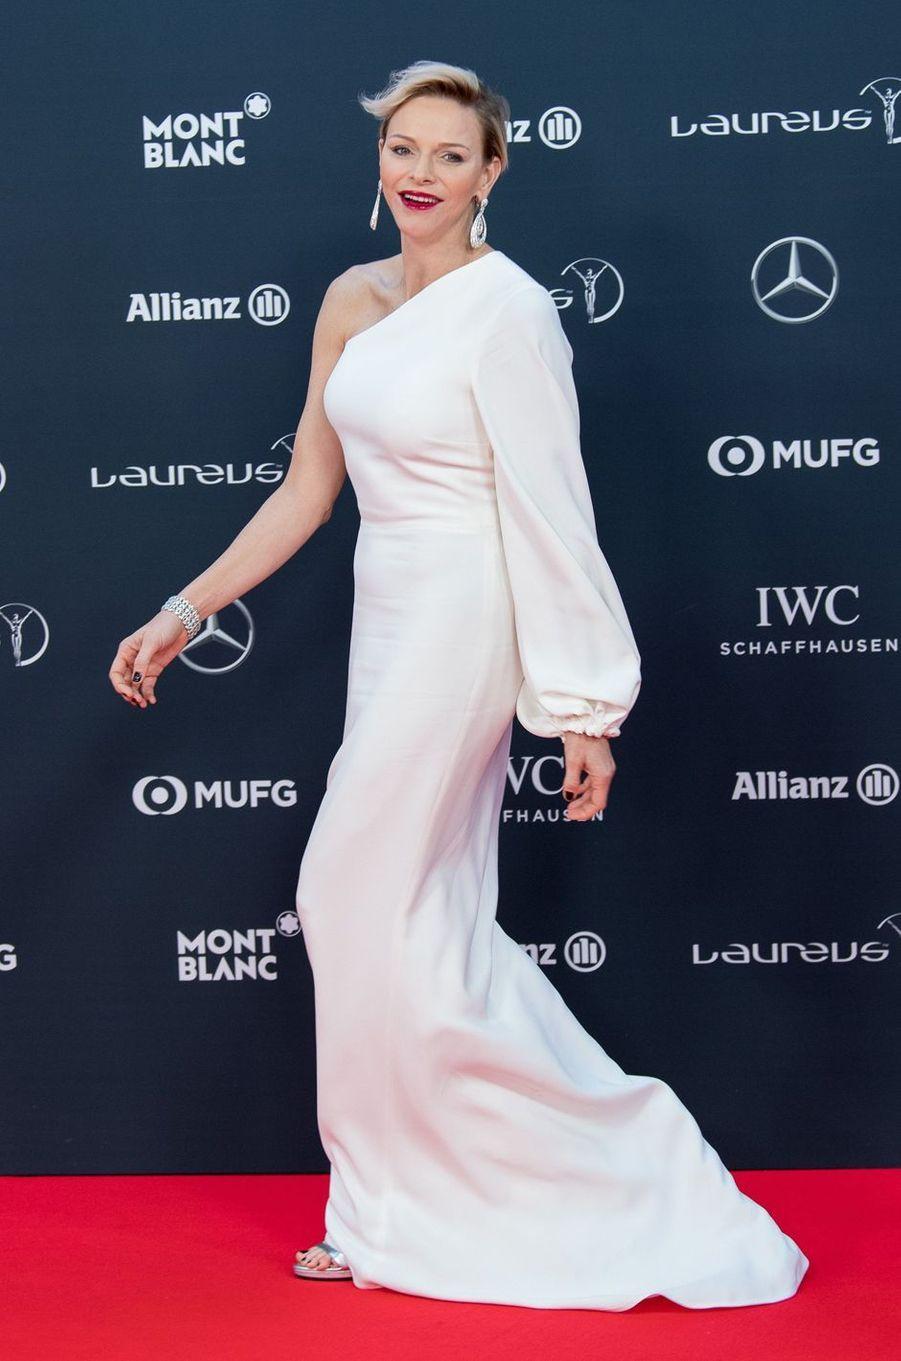 La princesse Charlène de Monaco en Stella McCartney, le 22 février 2018